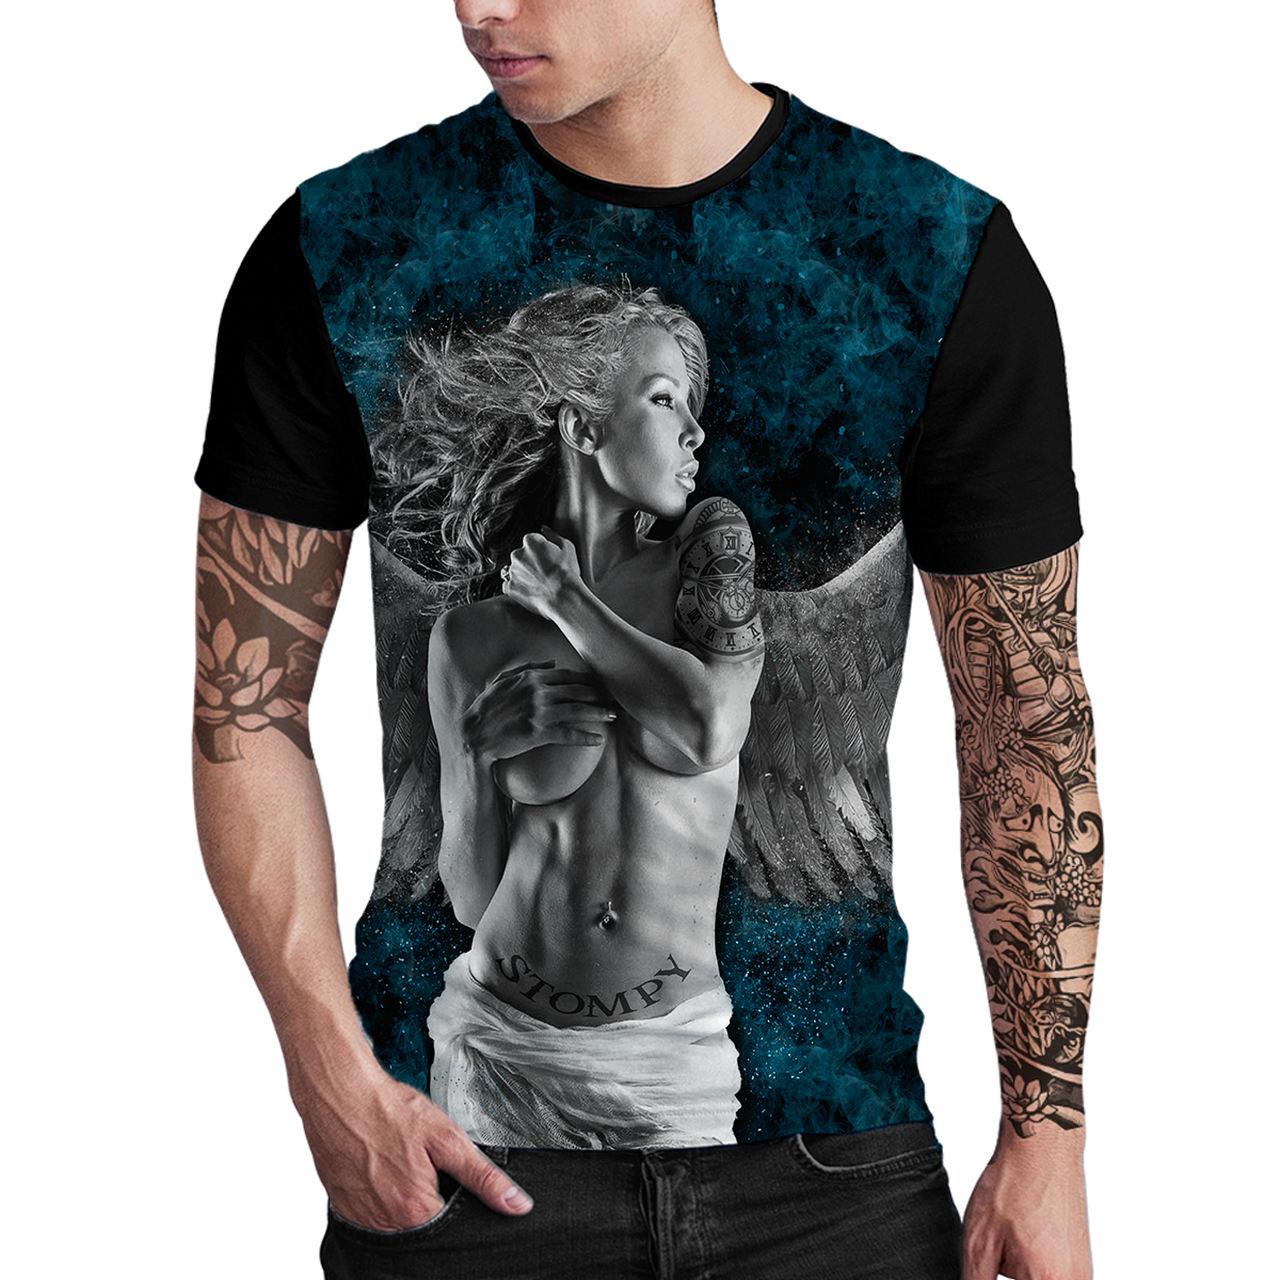 Stompy Camiseta Estampada Masculina Modelo 78